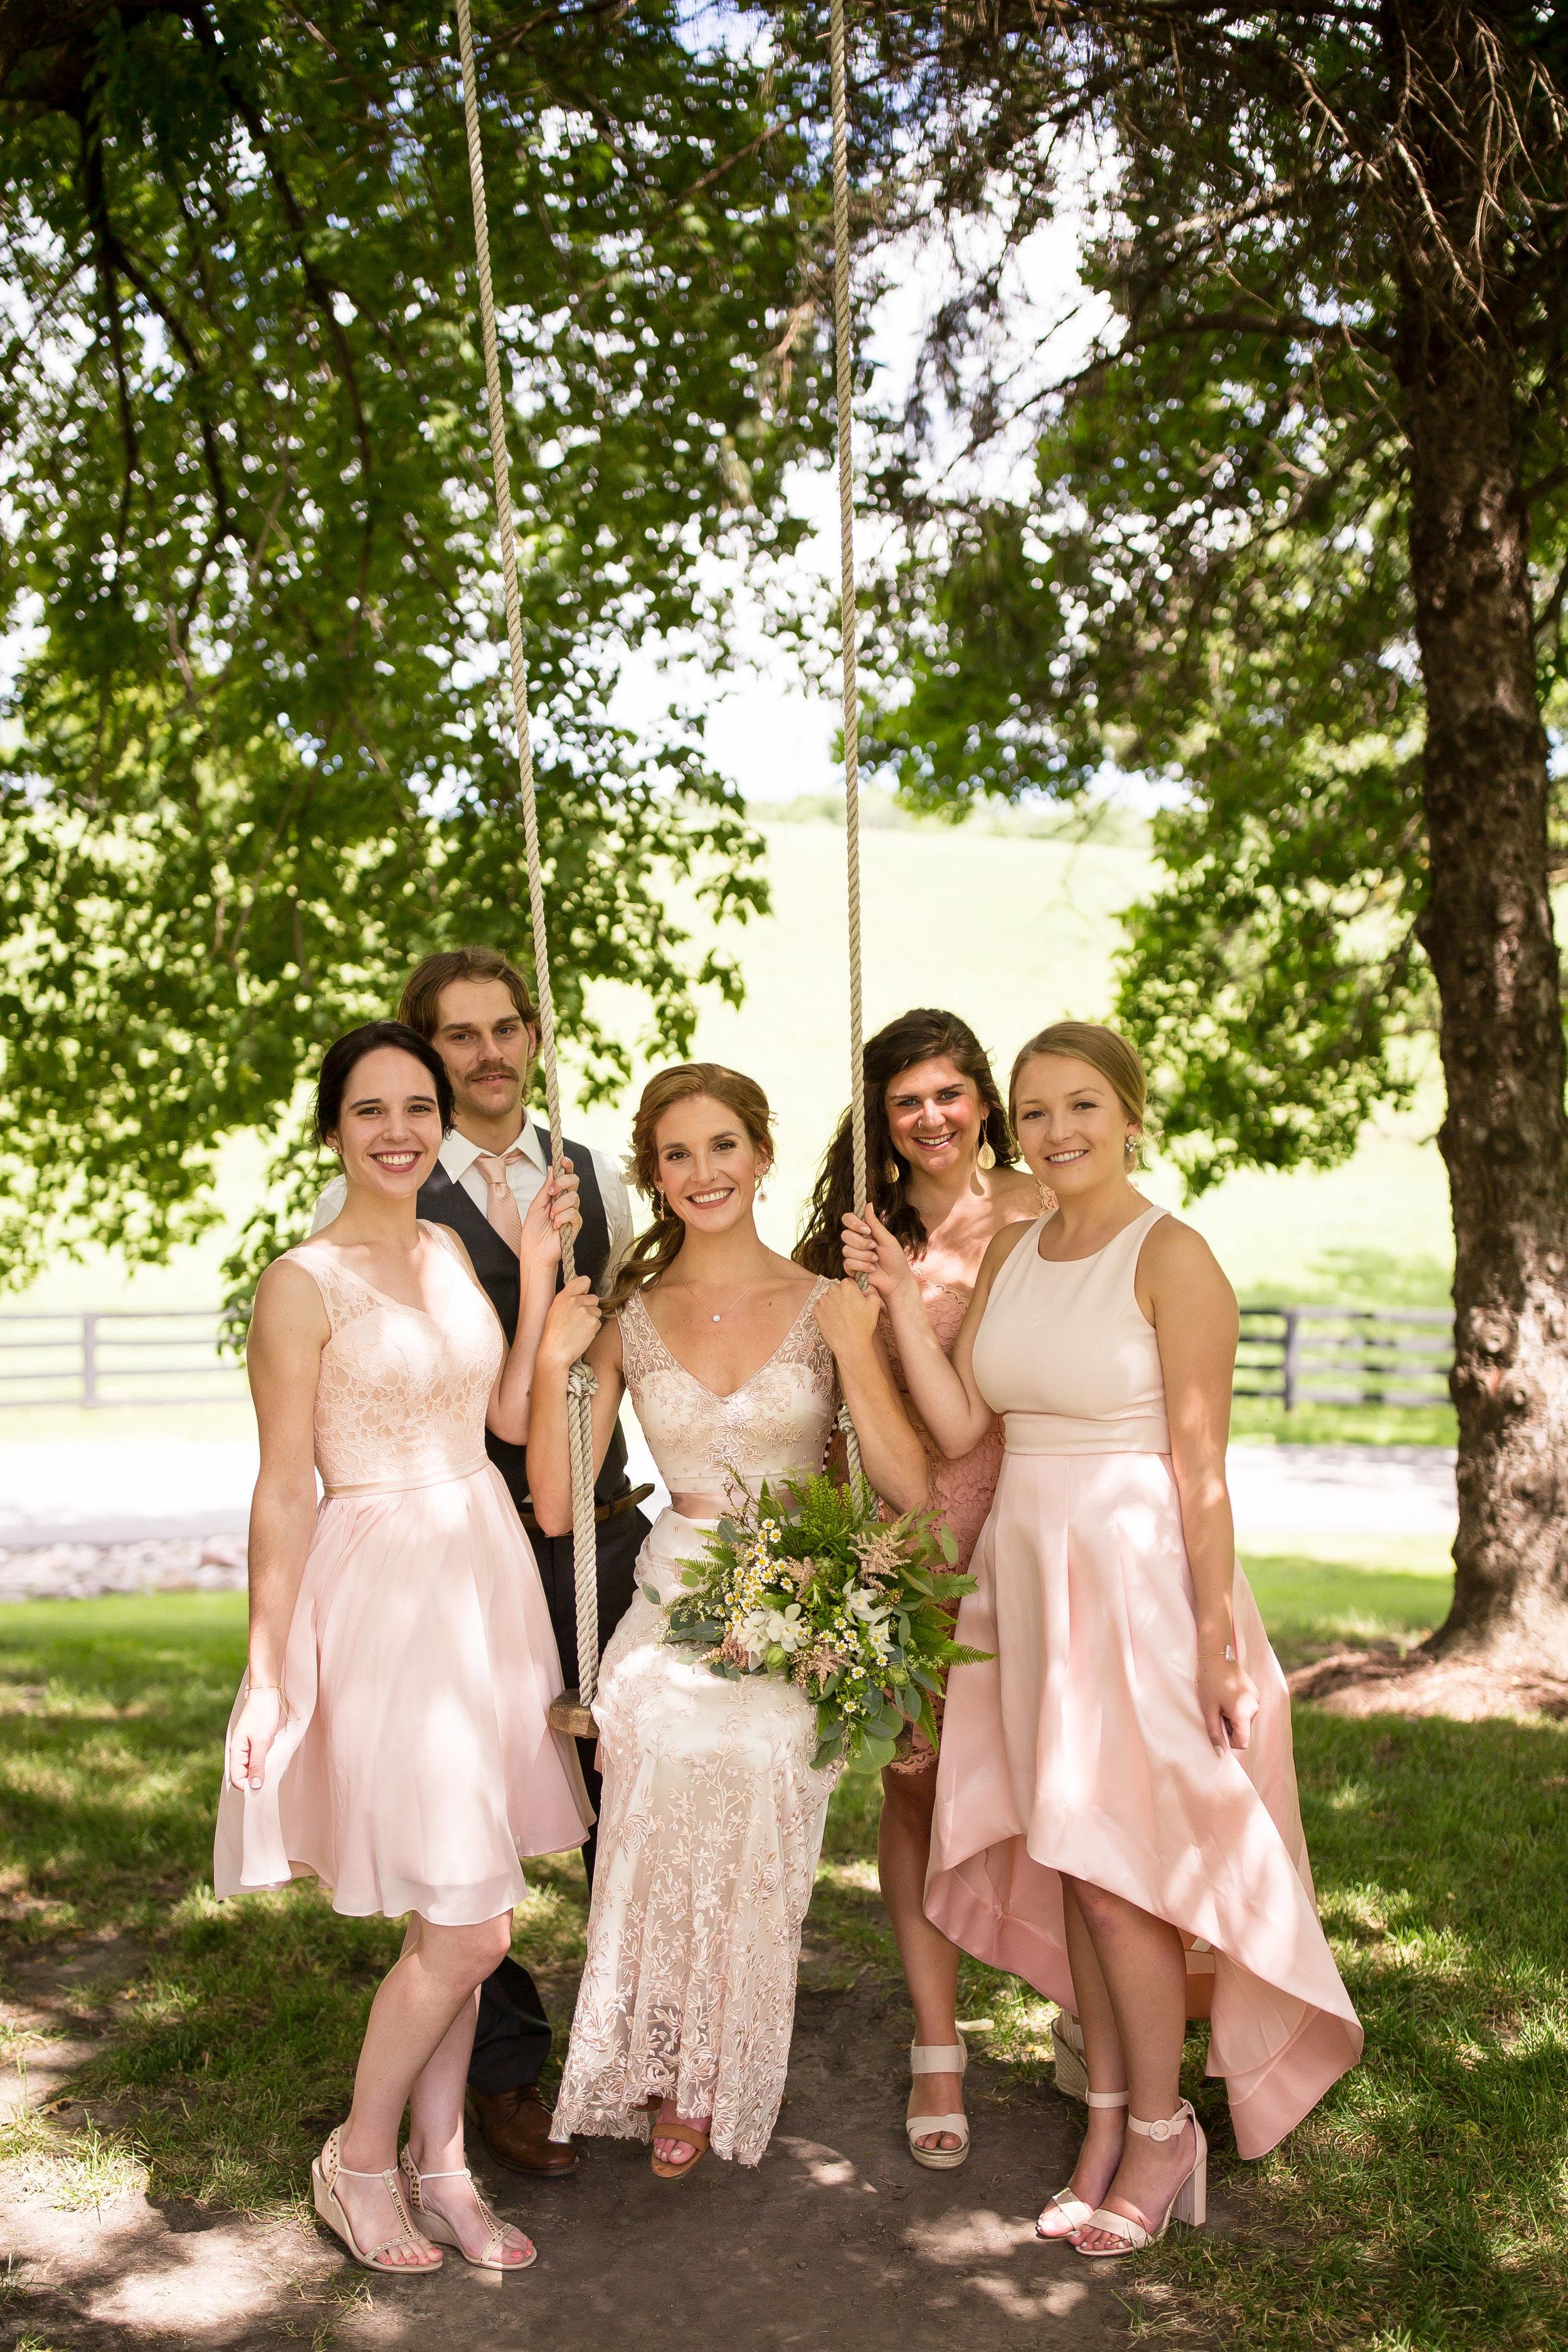 Brooke Brittney Wedding-Brooke Brittney-0183.jpg